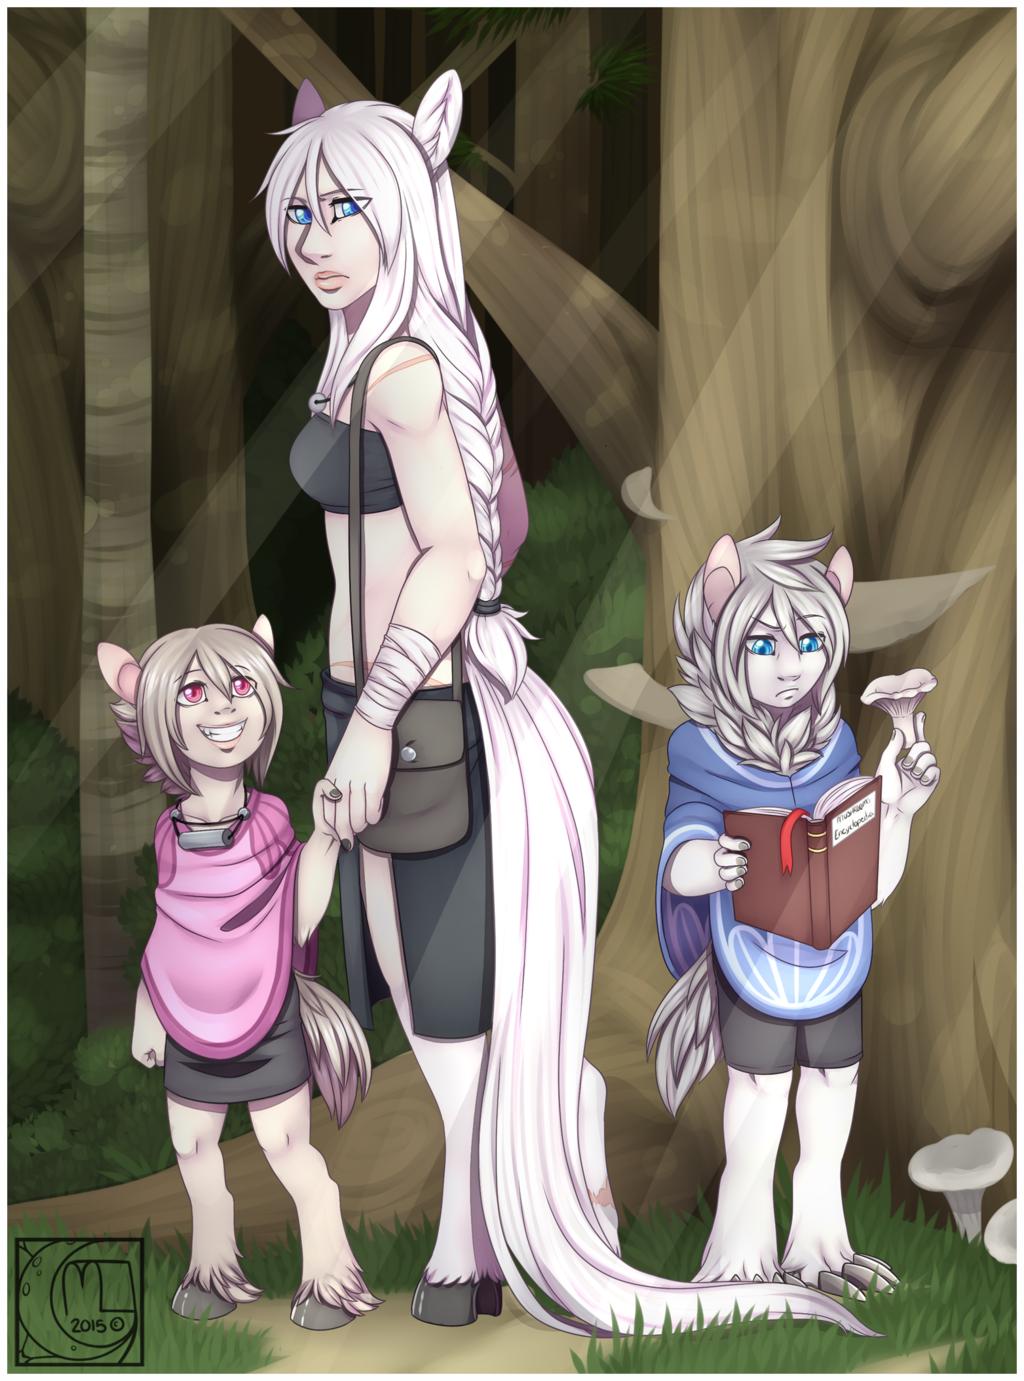 Personnal- Family bond